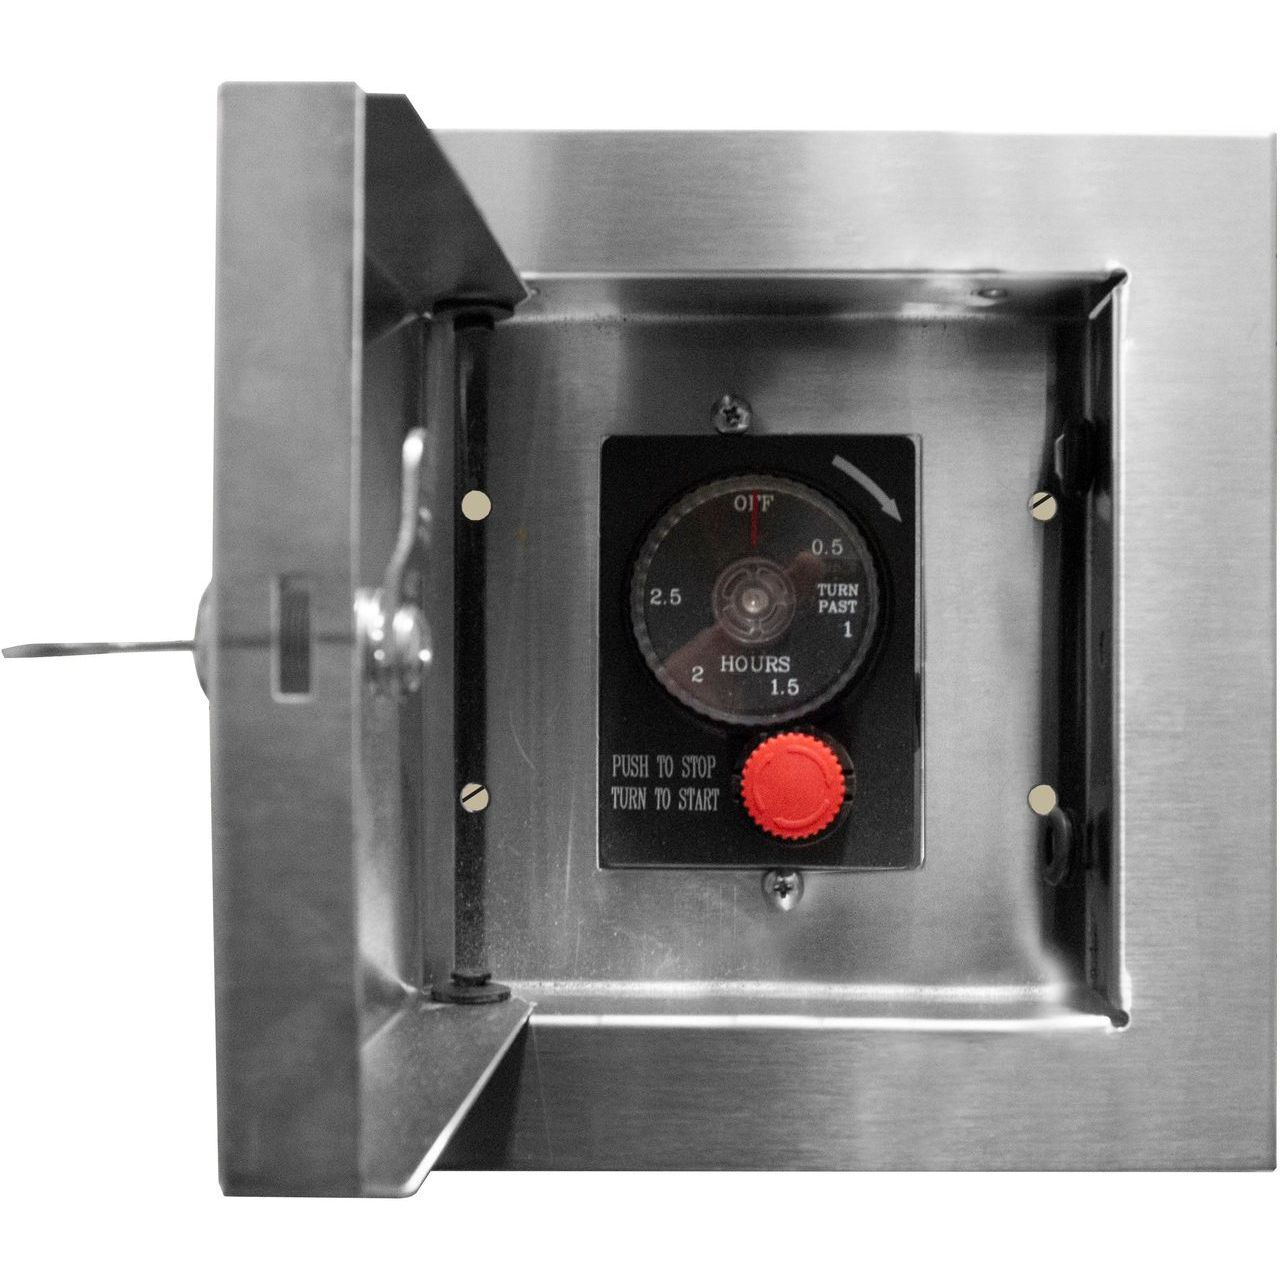 Summerset E-STOP Gas Timer Locking Cabinet Kit